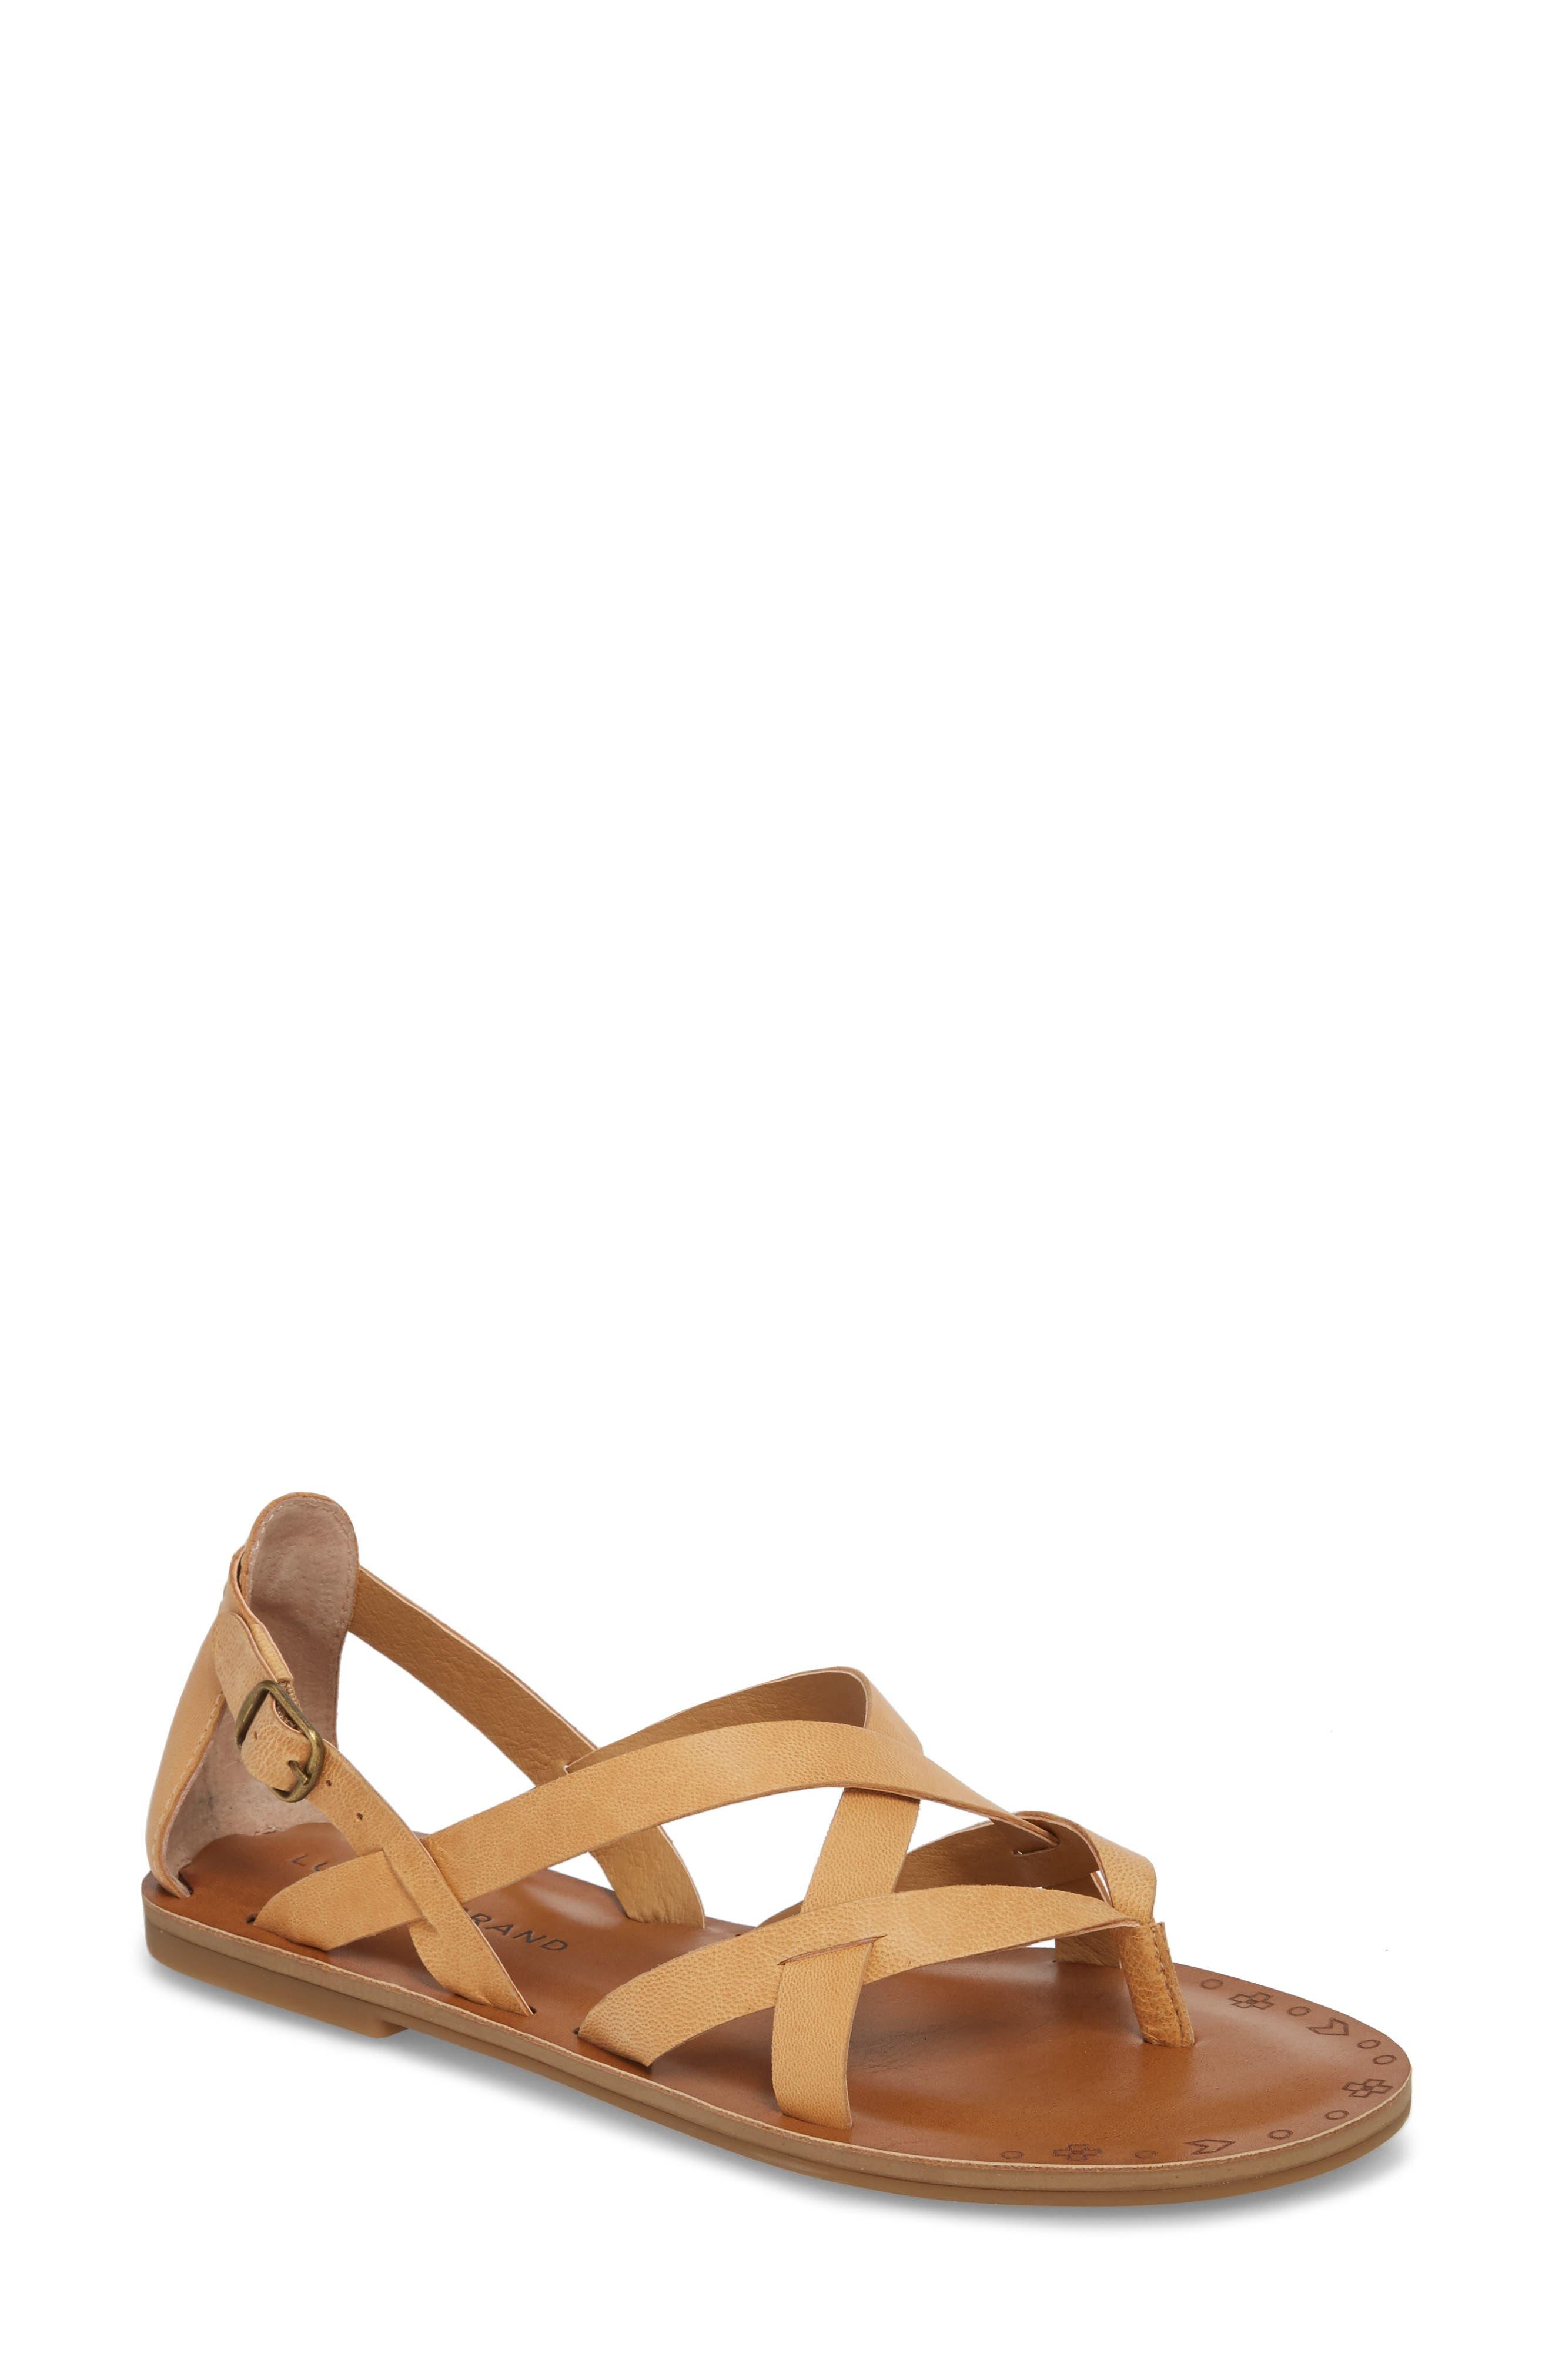 Ainsley Flat Sandal,                         Main,                         color, BUFF LEATHER